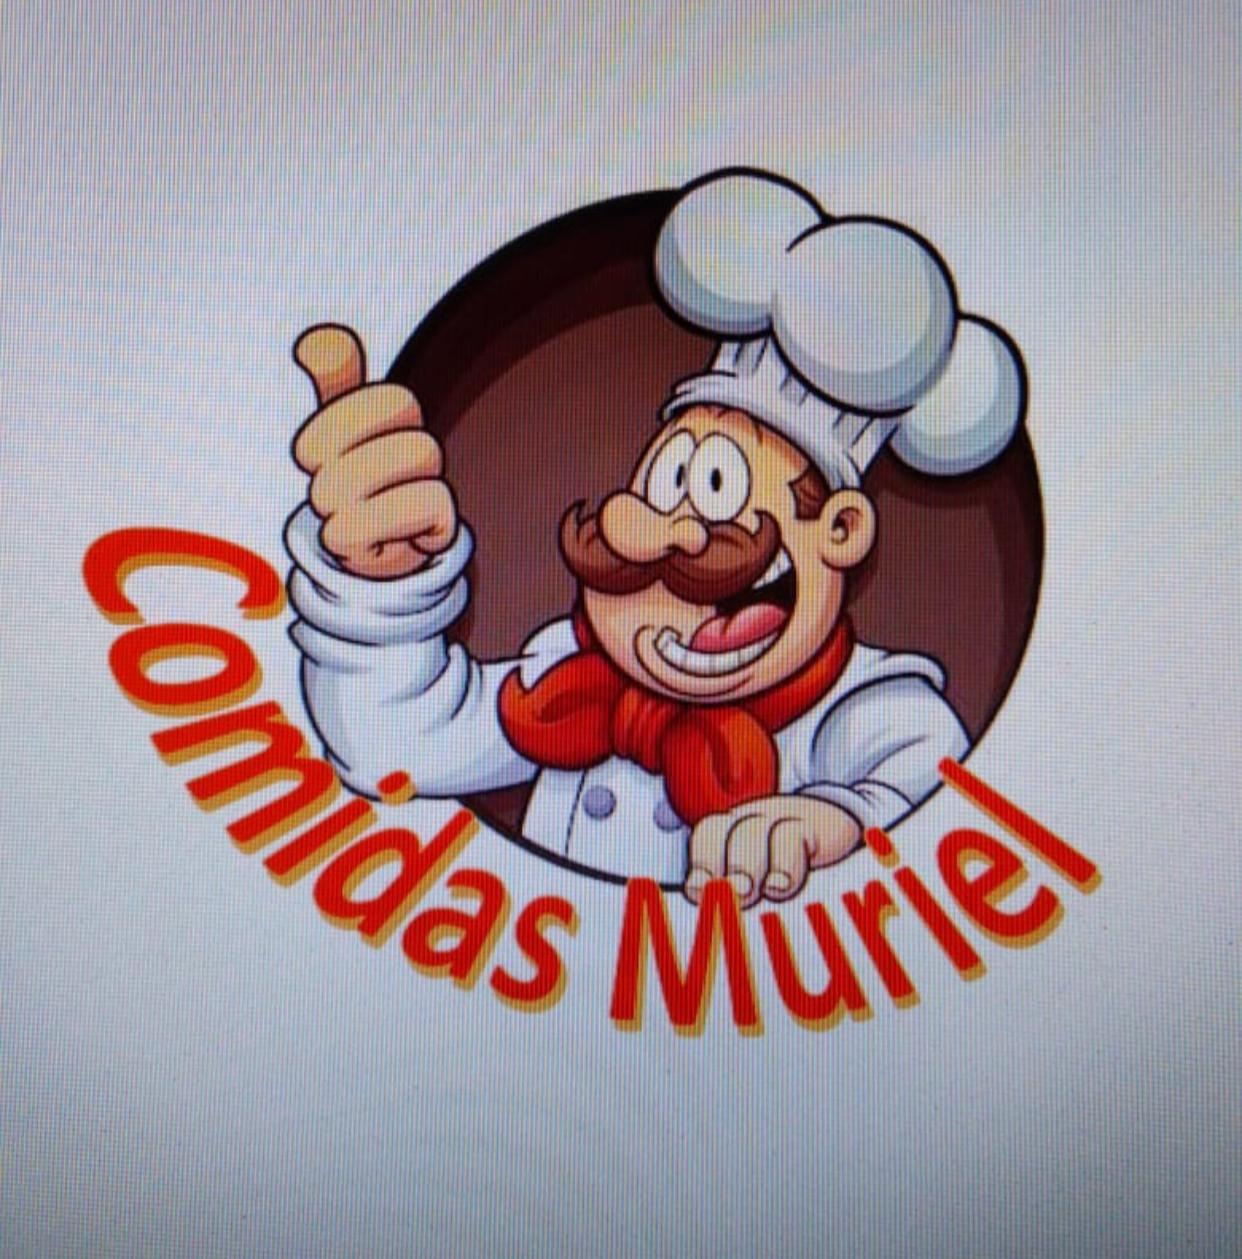 Comidas Muriel